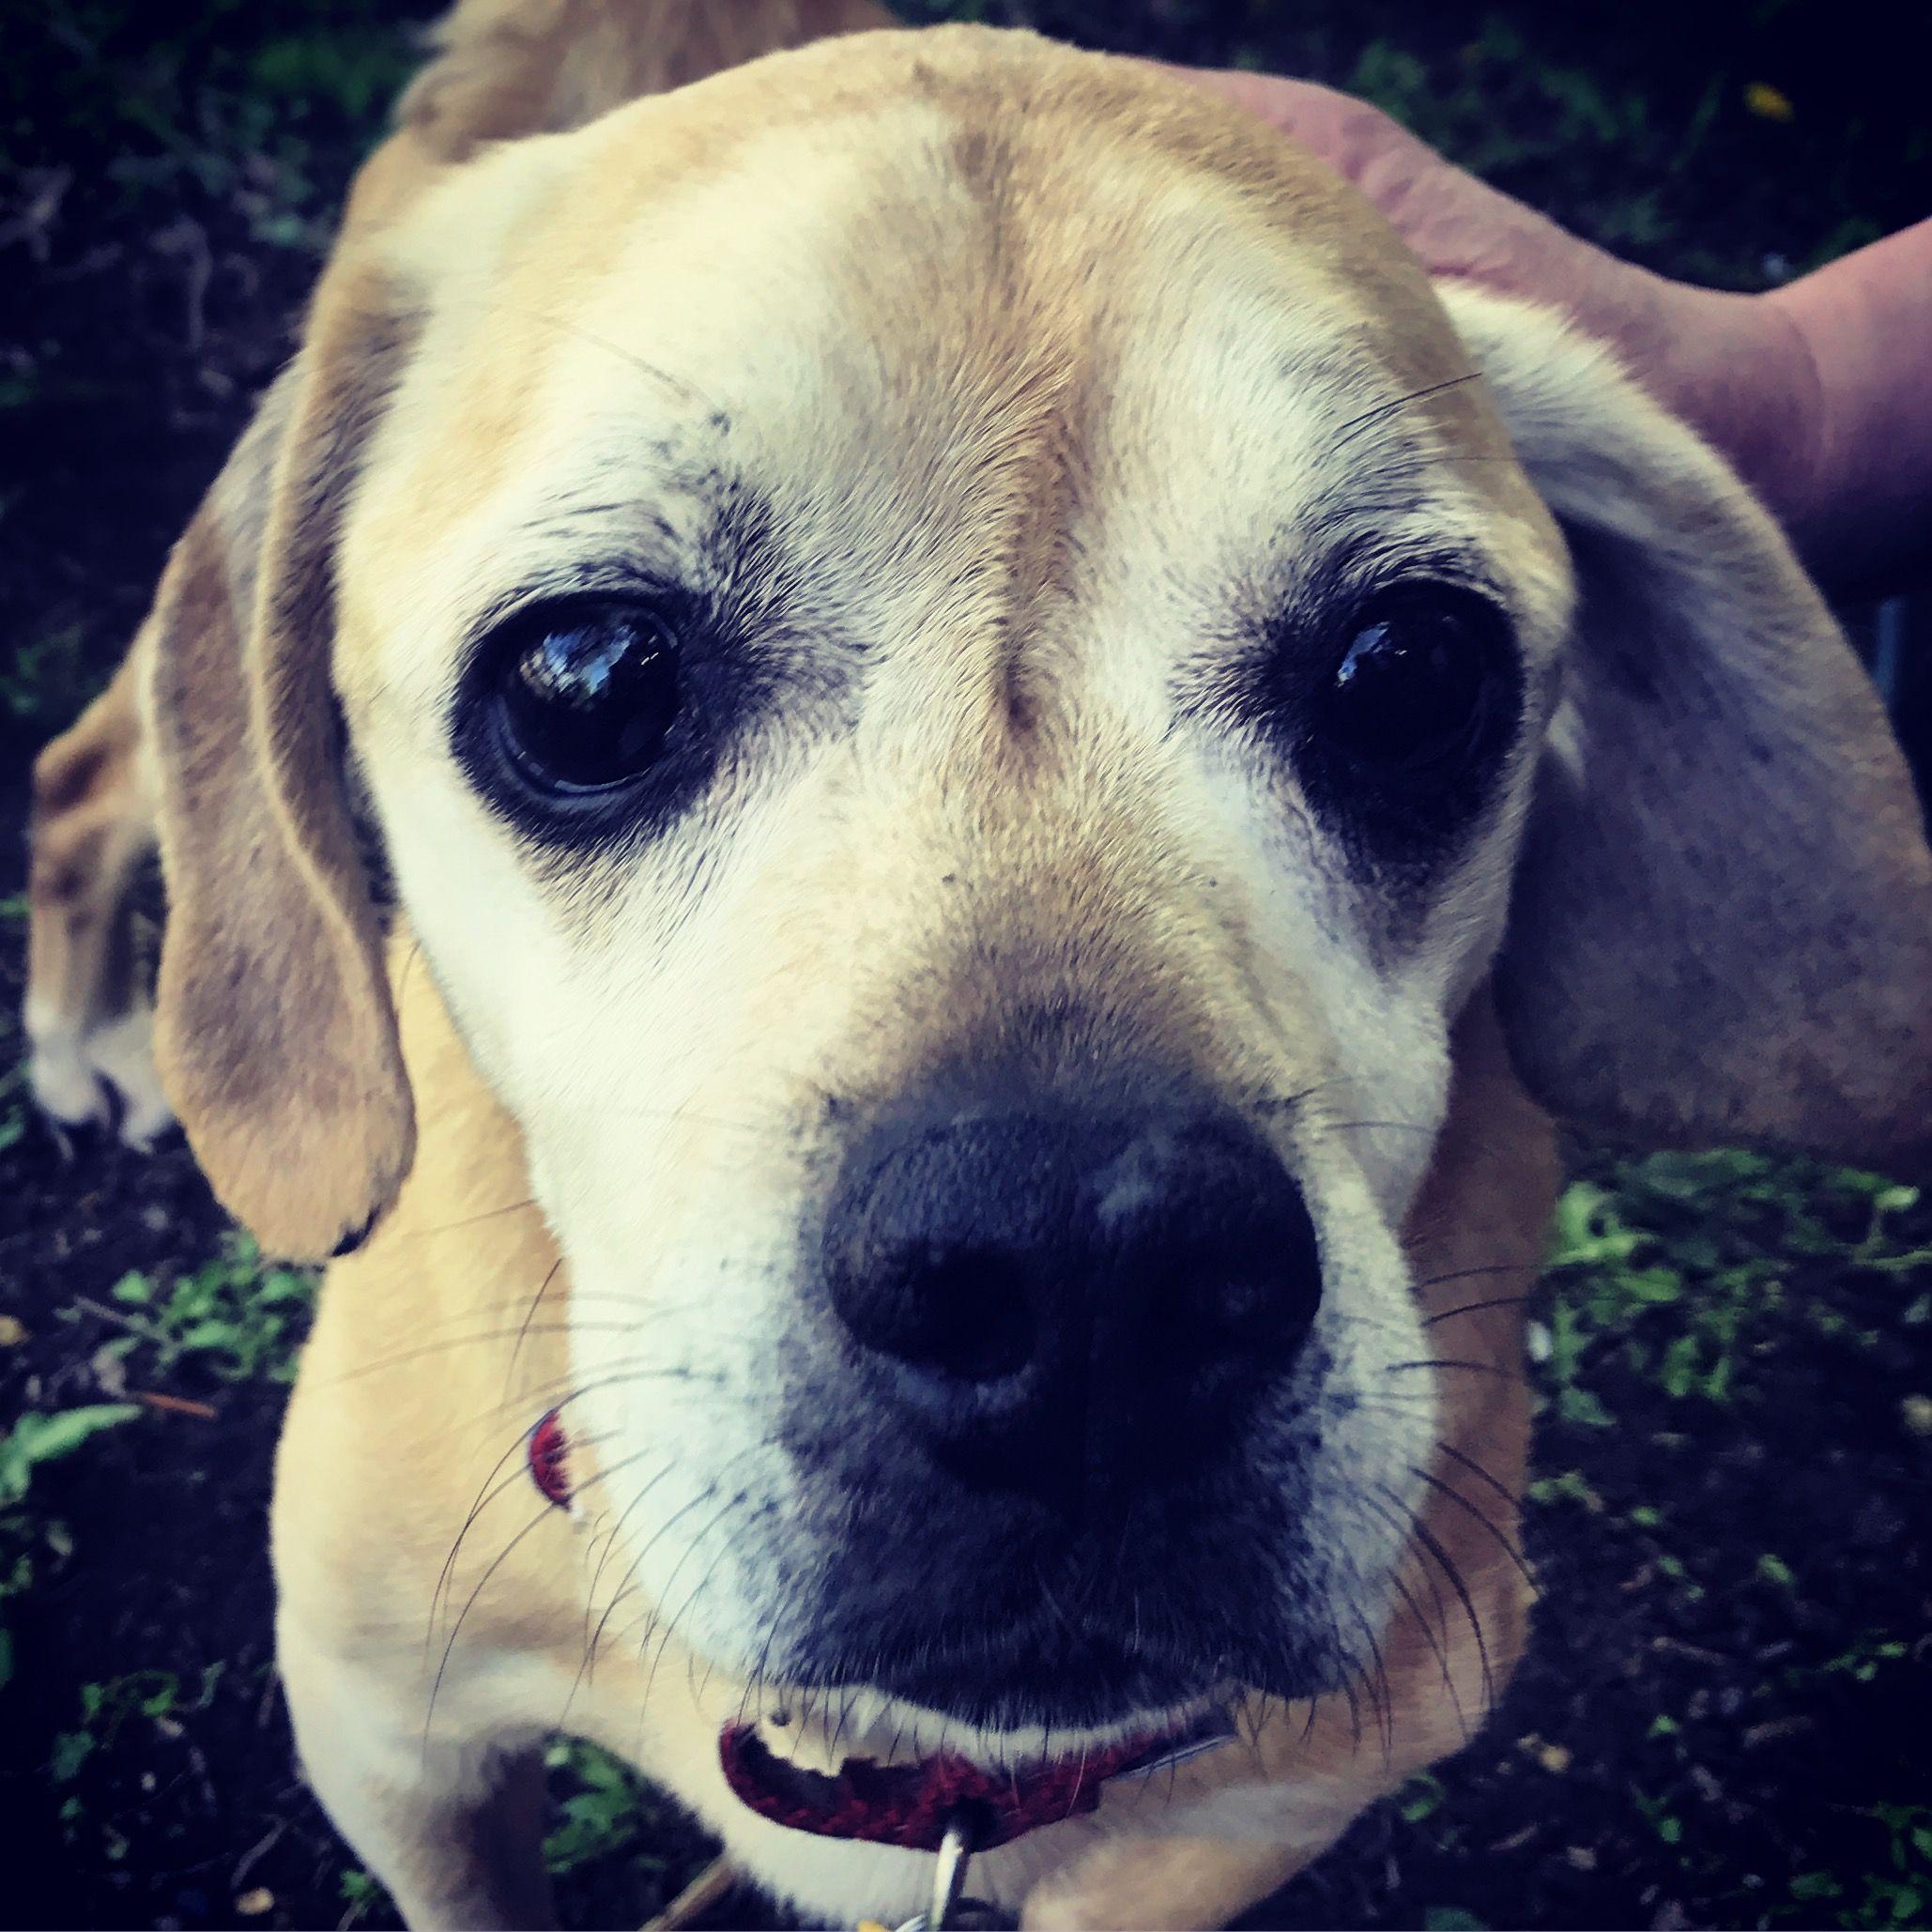 Puggle dog for Adoption in Shakopee, MN. ADN-564052 on PuppyFinder.com